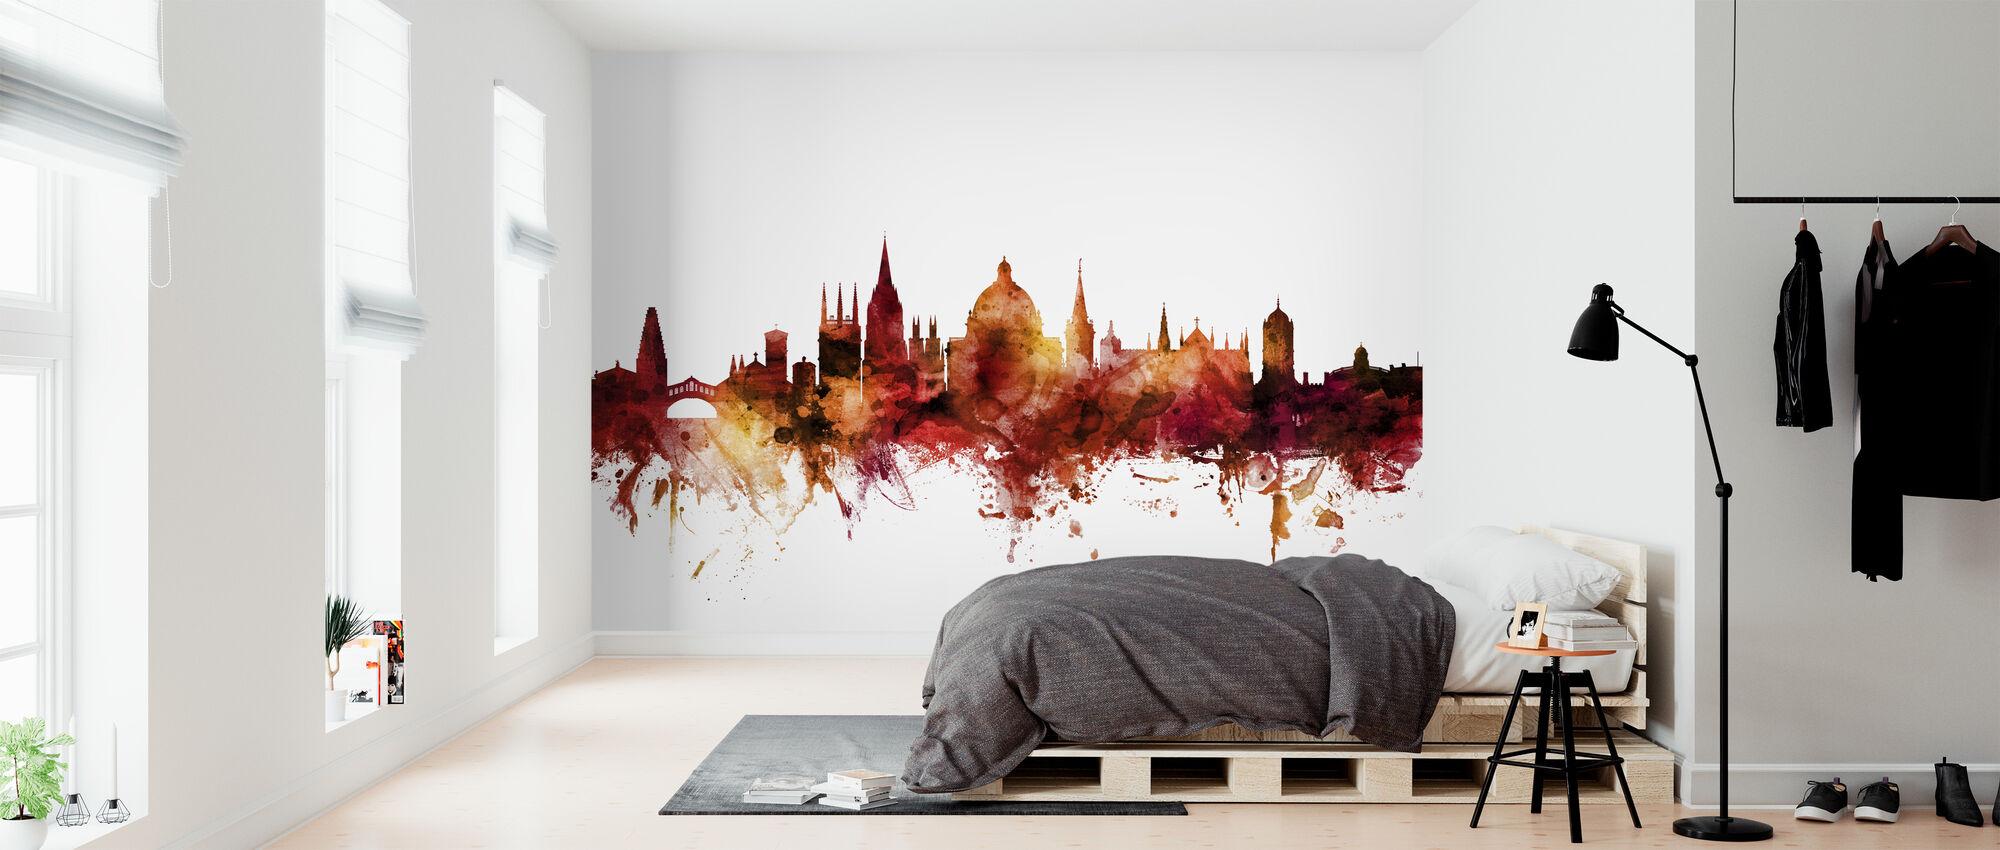 Oxford England Skyline - Wallpaper - Bedroom